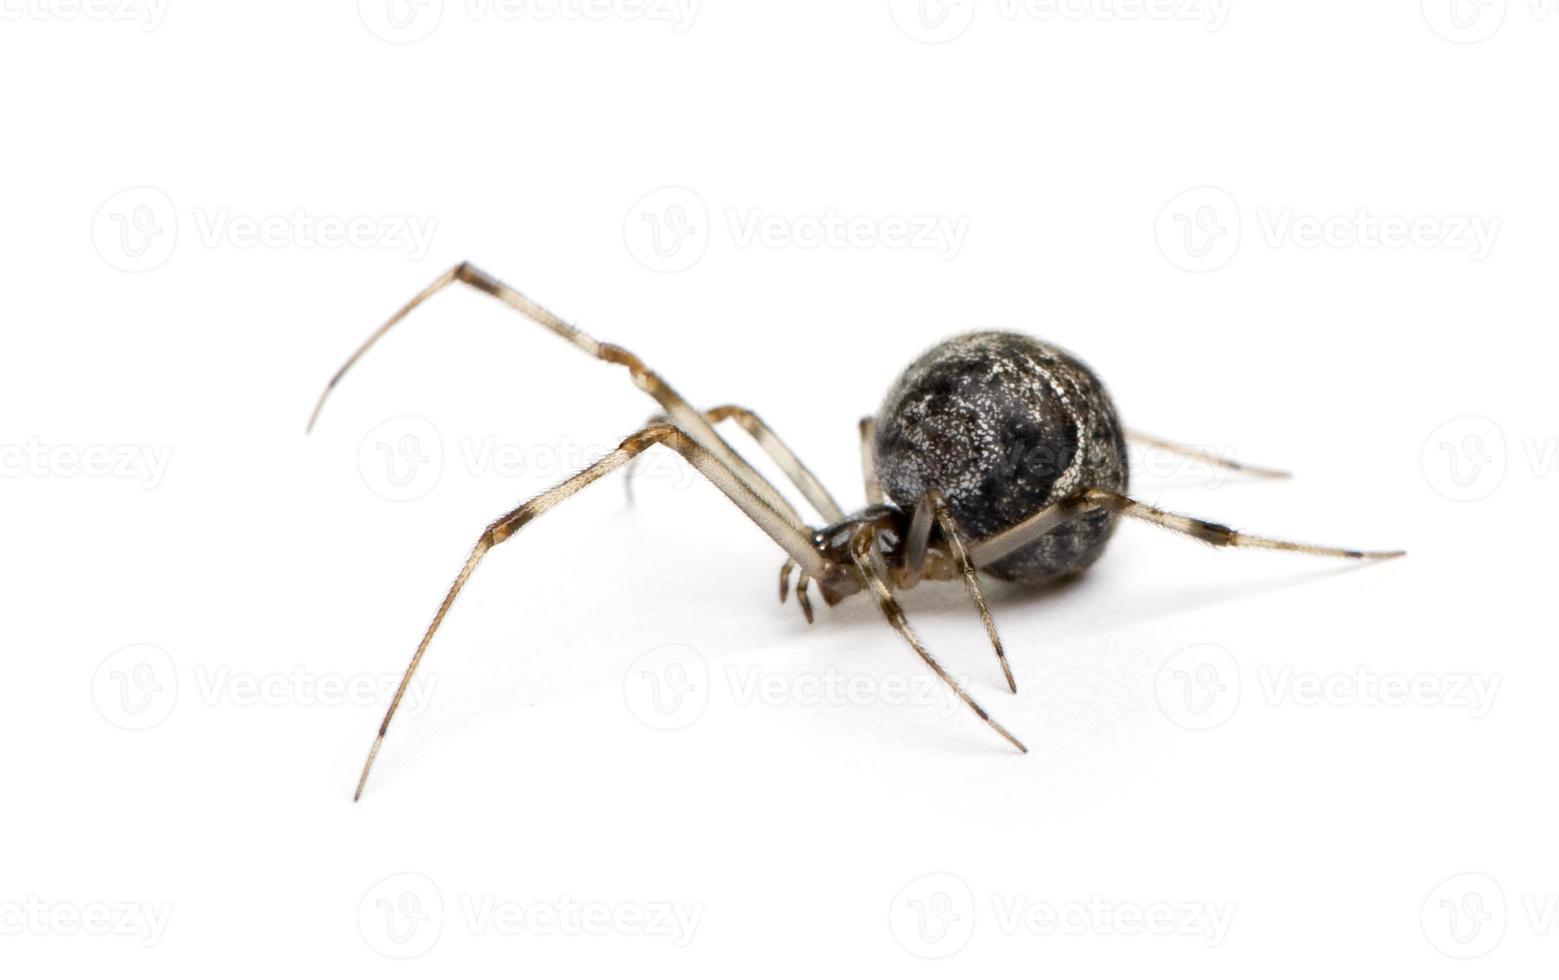 Araña común de la casa - achaearanea tepidariorum foto